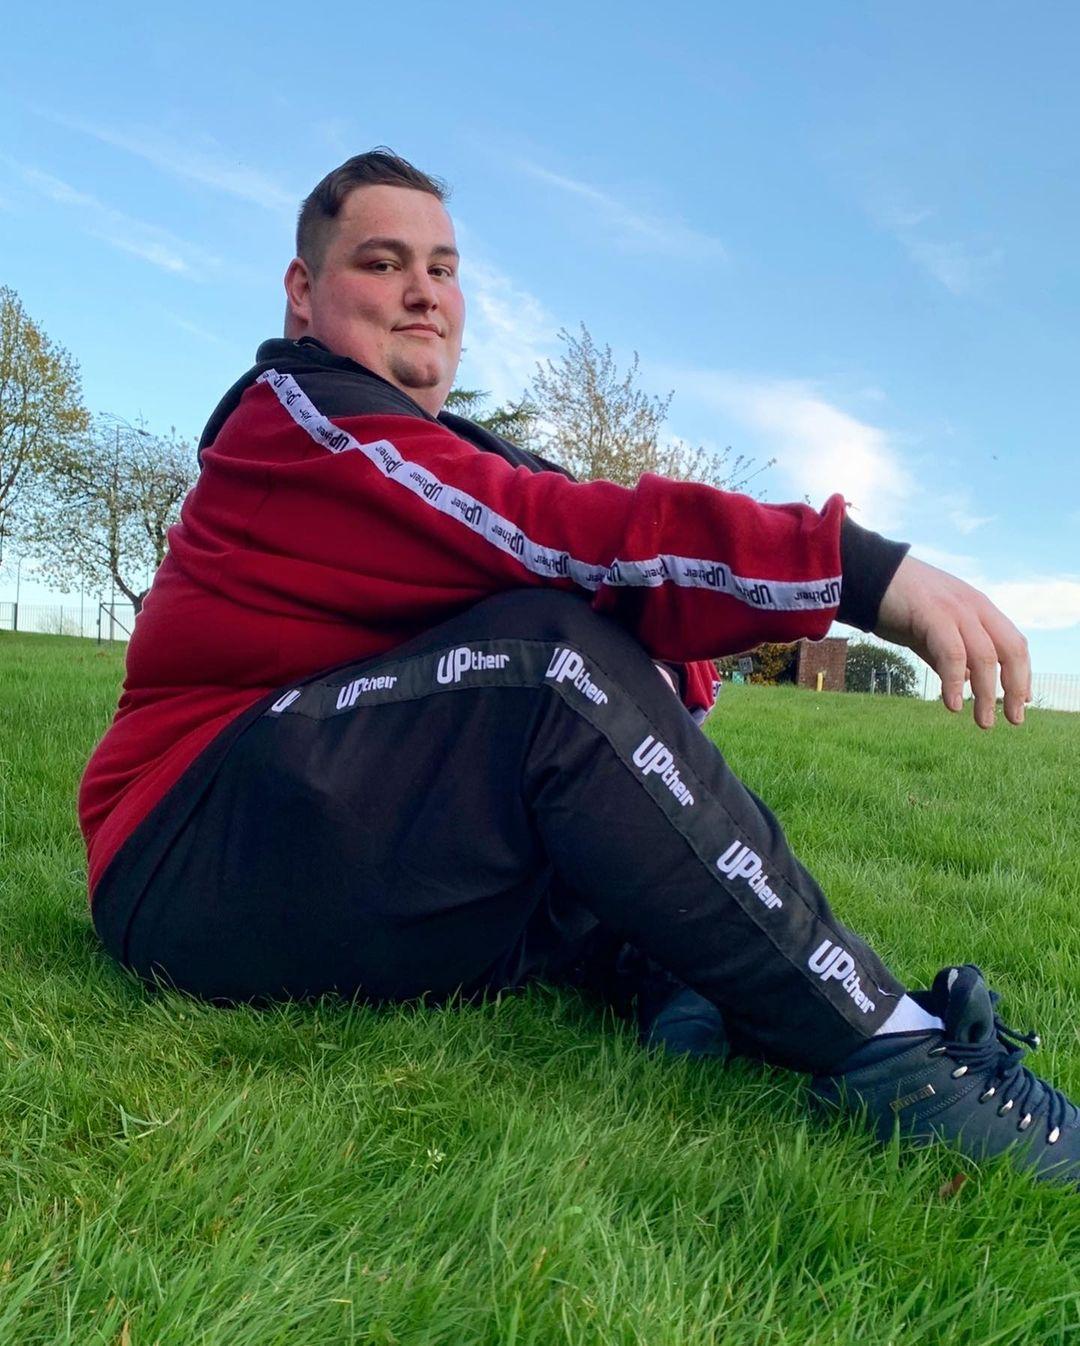 Steven Mckell sitting sideways on grass wearing black Uptheir tracksuit bottoms and red sweatshirt